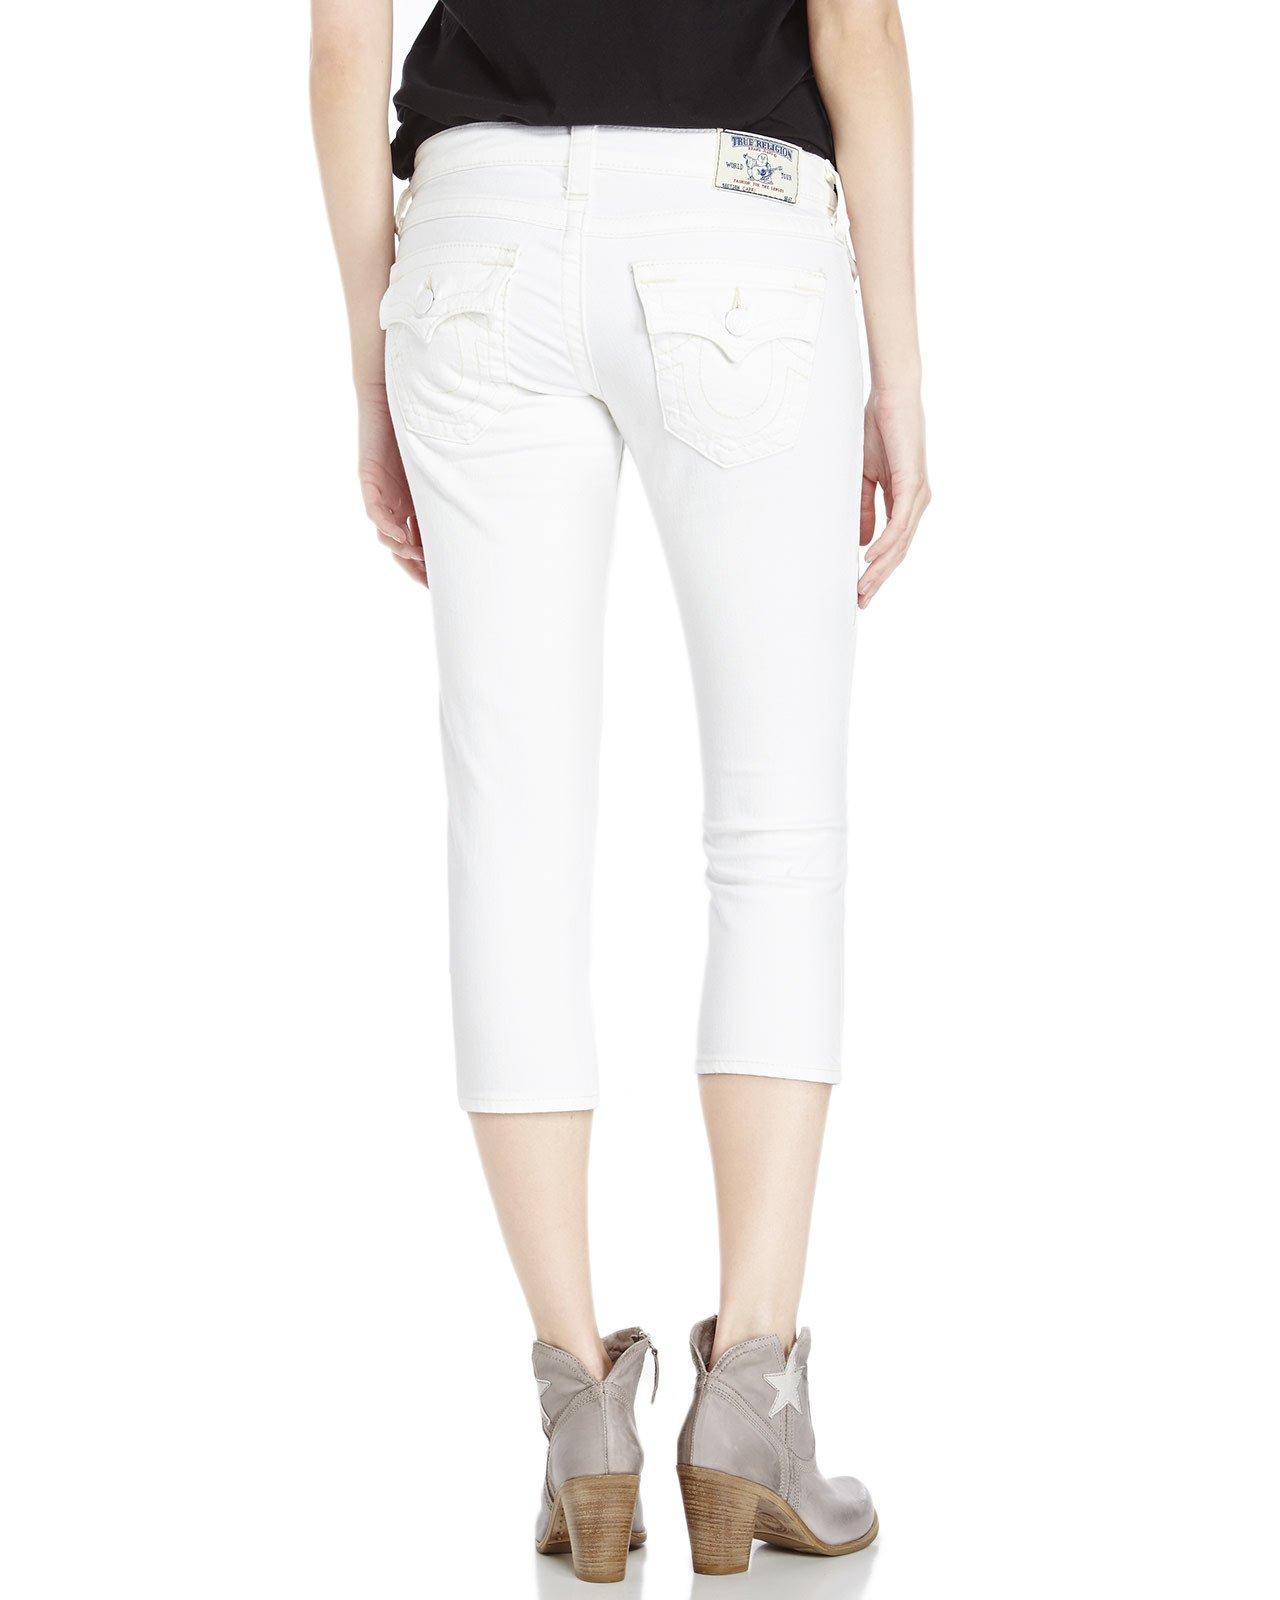 Lyst True Religion White Denim Capri Pants In White